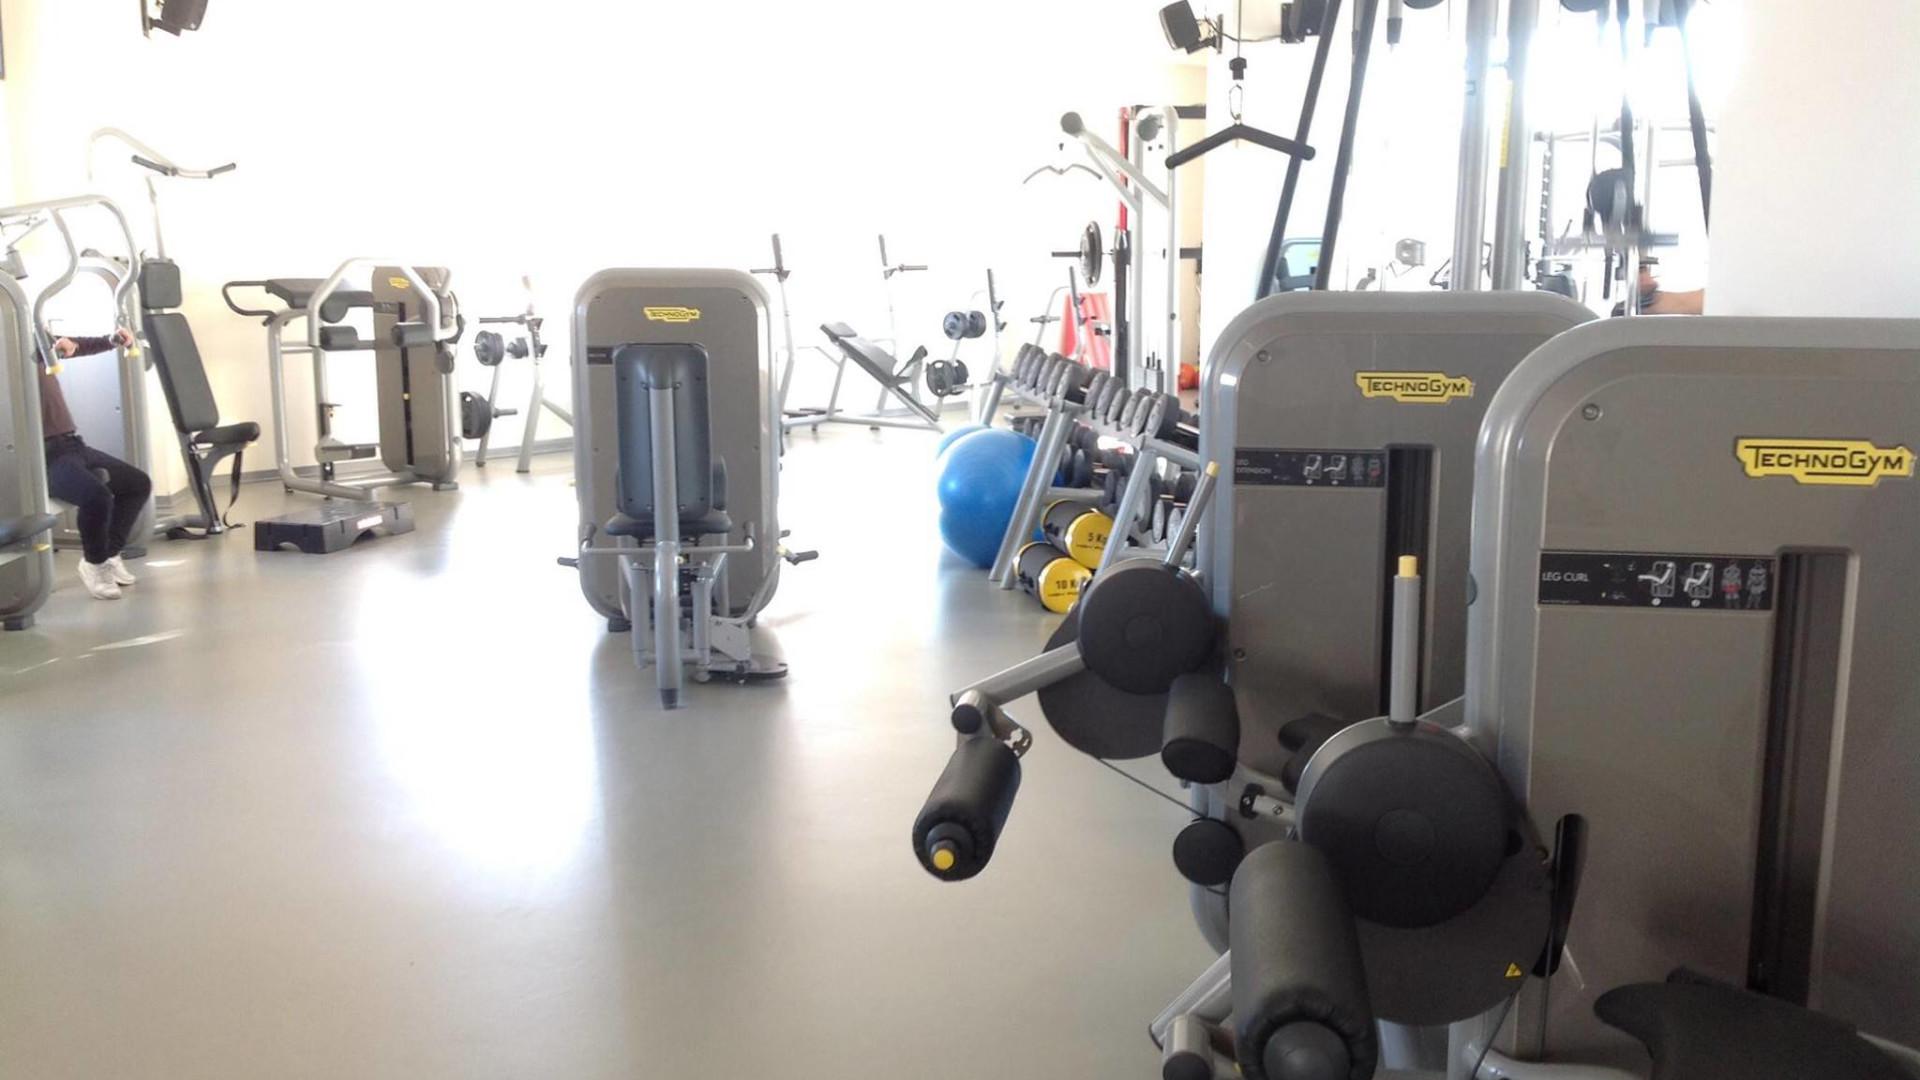 3.0 Fitness Club  offerte